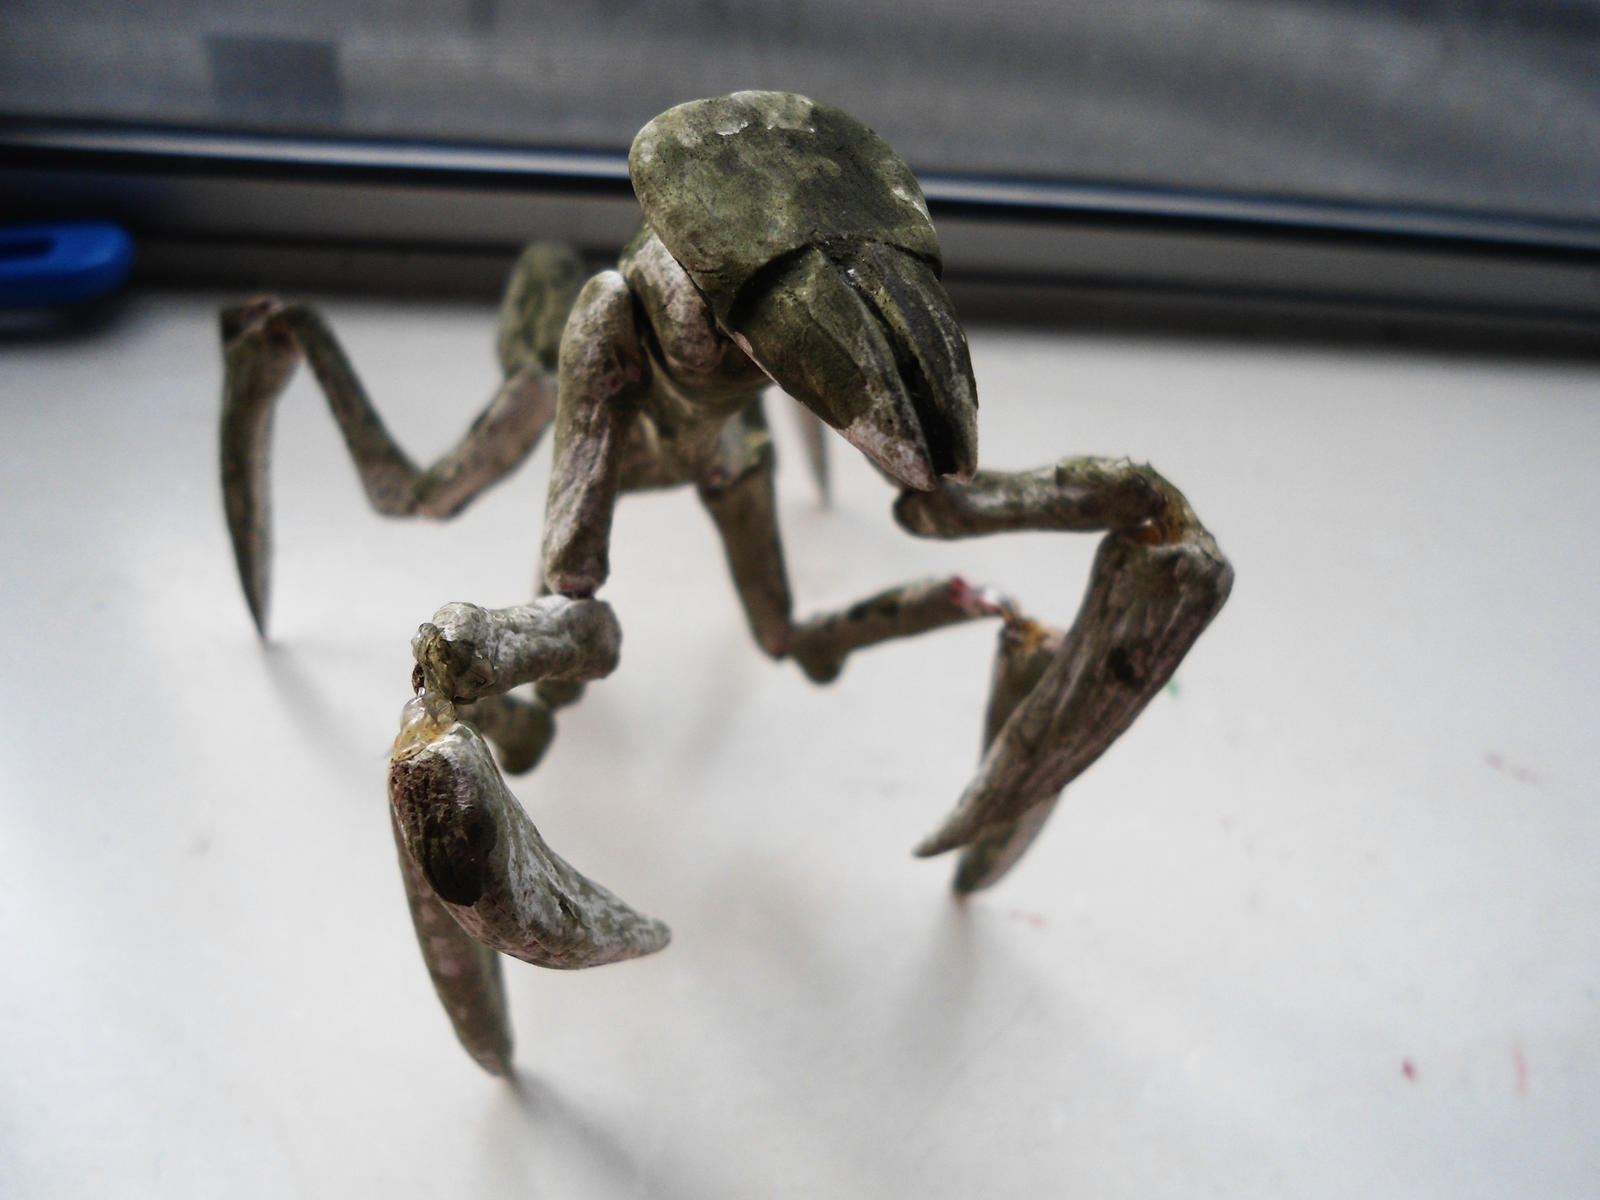 Godzilla Leg... Godzilla Vs Muto Toy